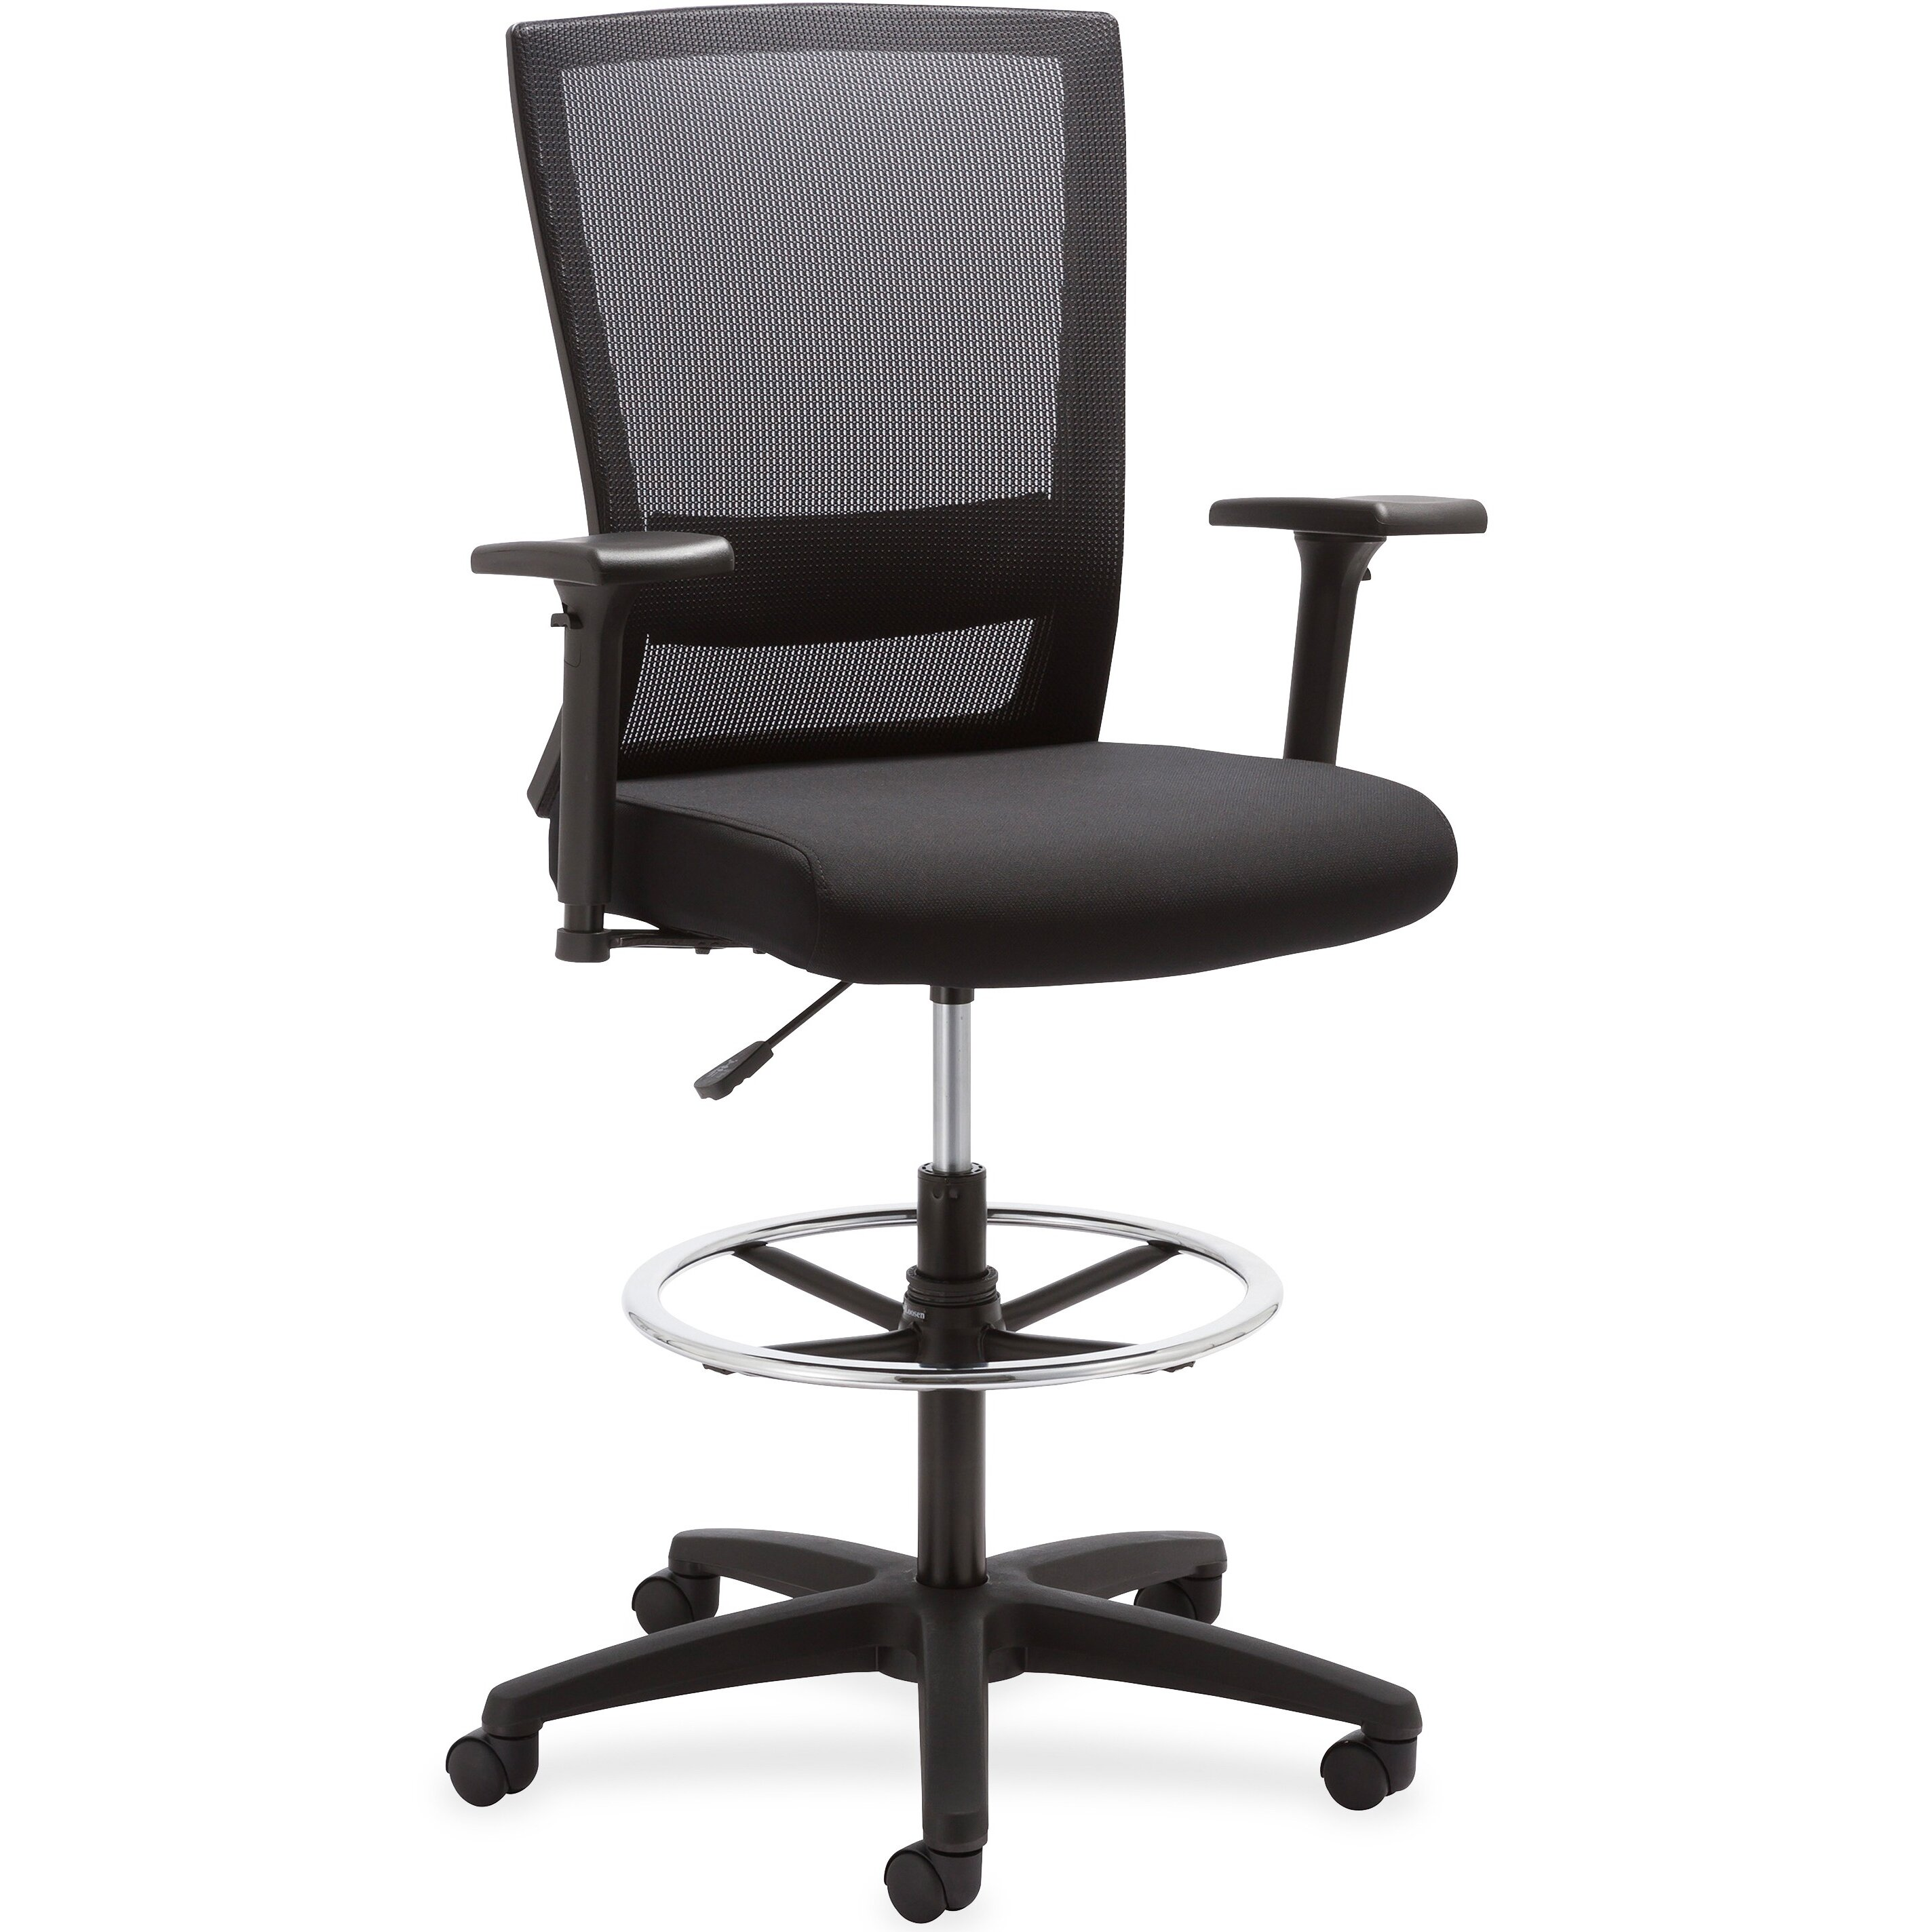 Lorell Mid Back Mesh Desk Chair